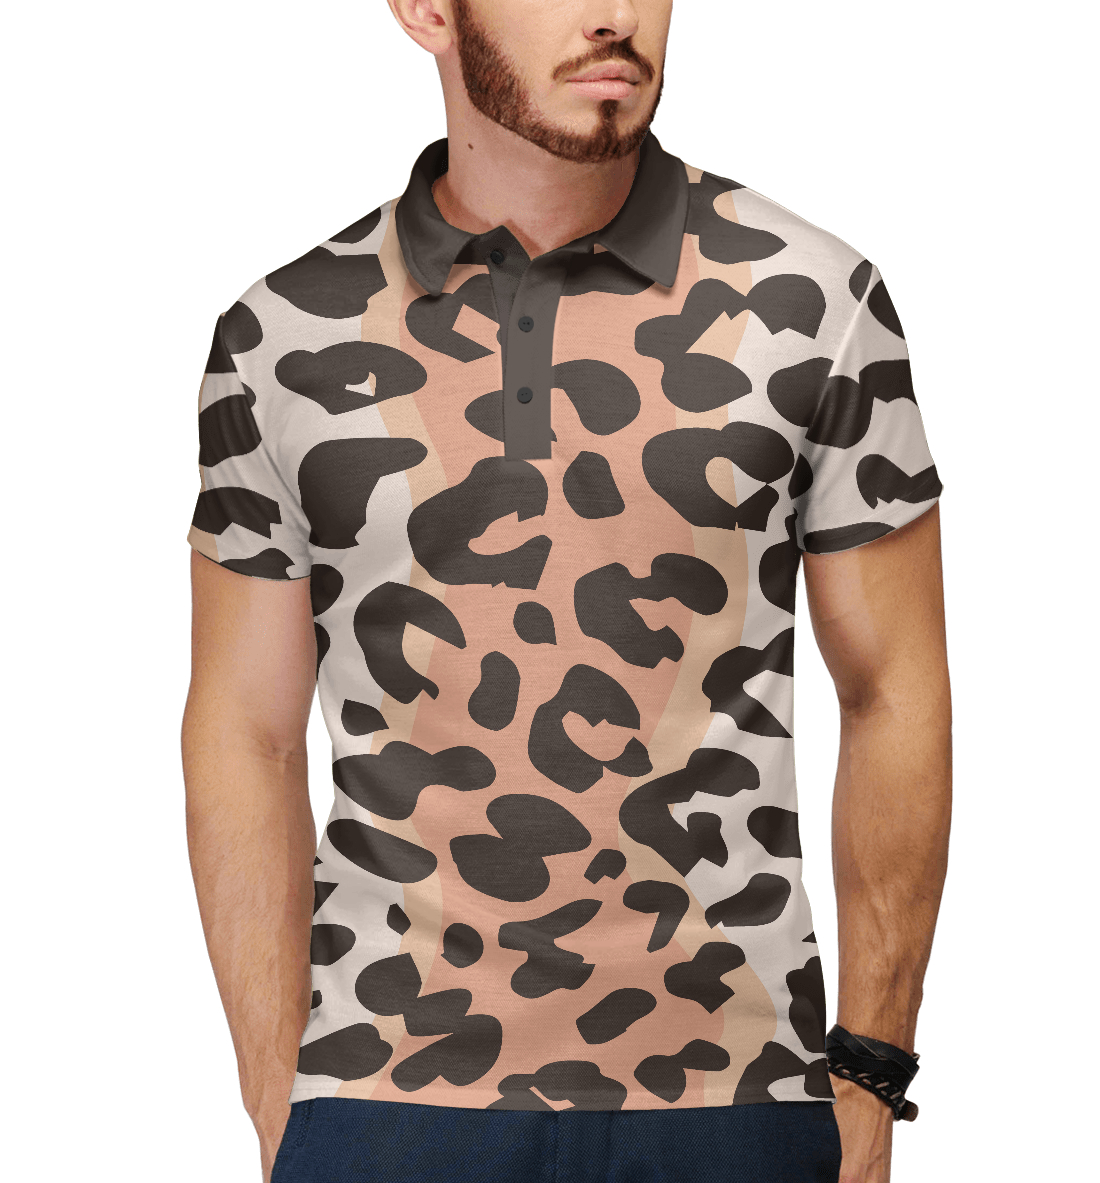 Купить Леопард, Printbar, Поло, OKR-208290-pol-2